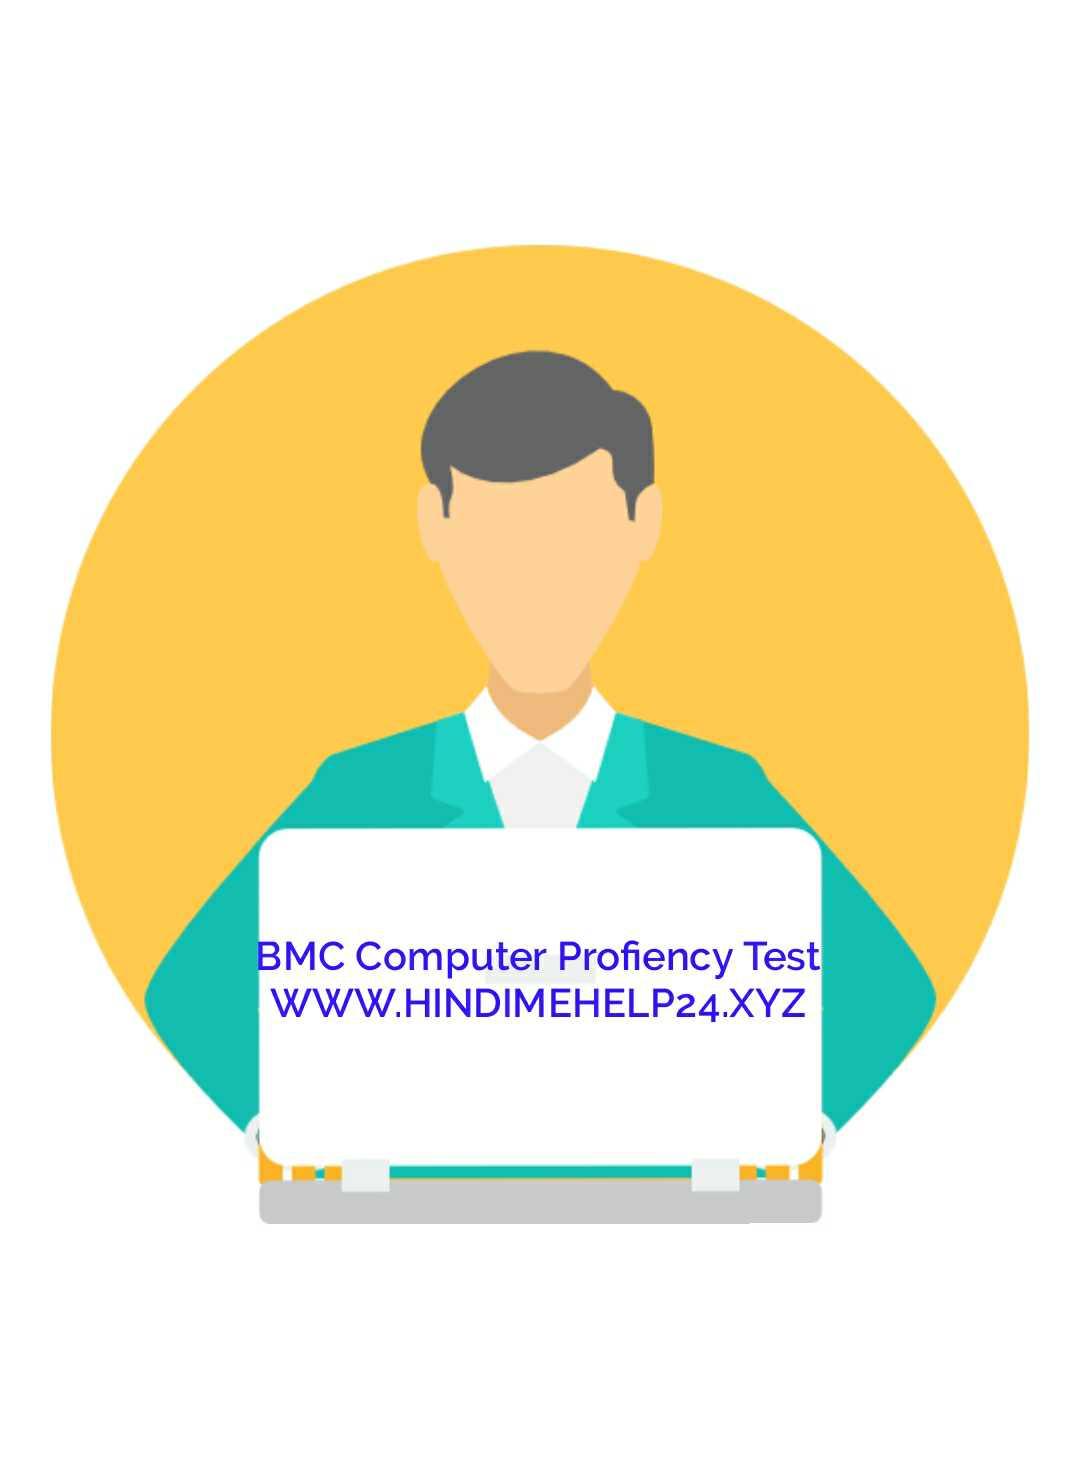 Bhavnagar Municipal Corporation (BMC) Junior Clerk Computer Profiency Test instruction 2020